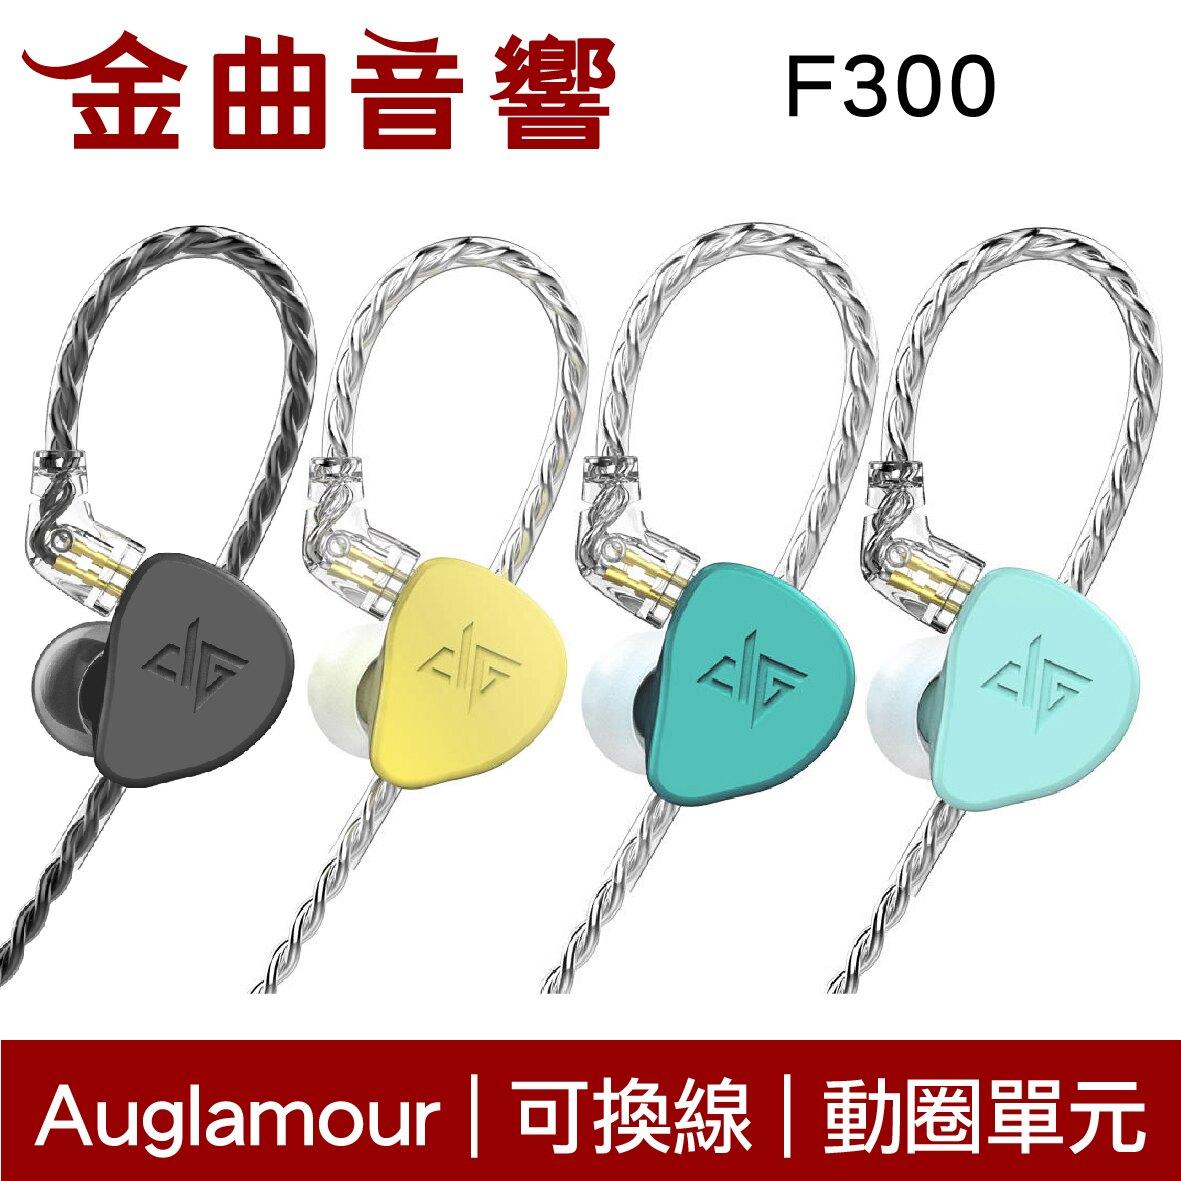 Auglamour 徠聲 F300 黛墨綠 耳道式耳機 可換線 | 金曲音響